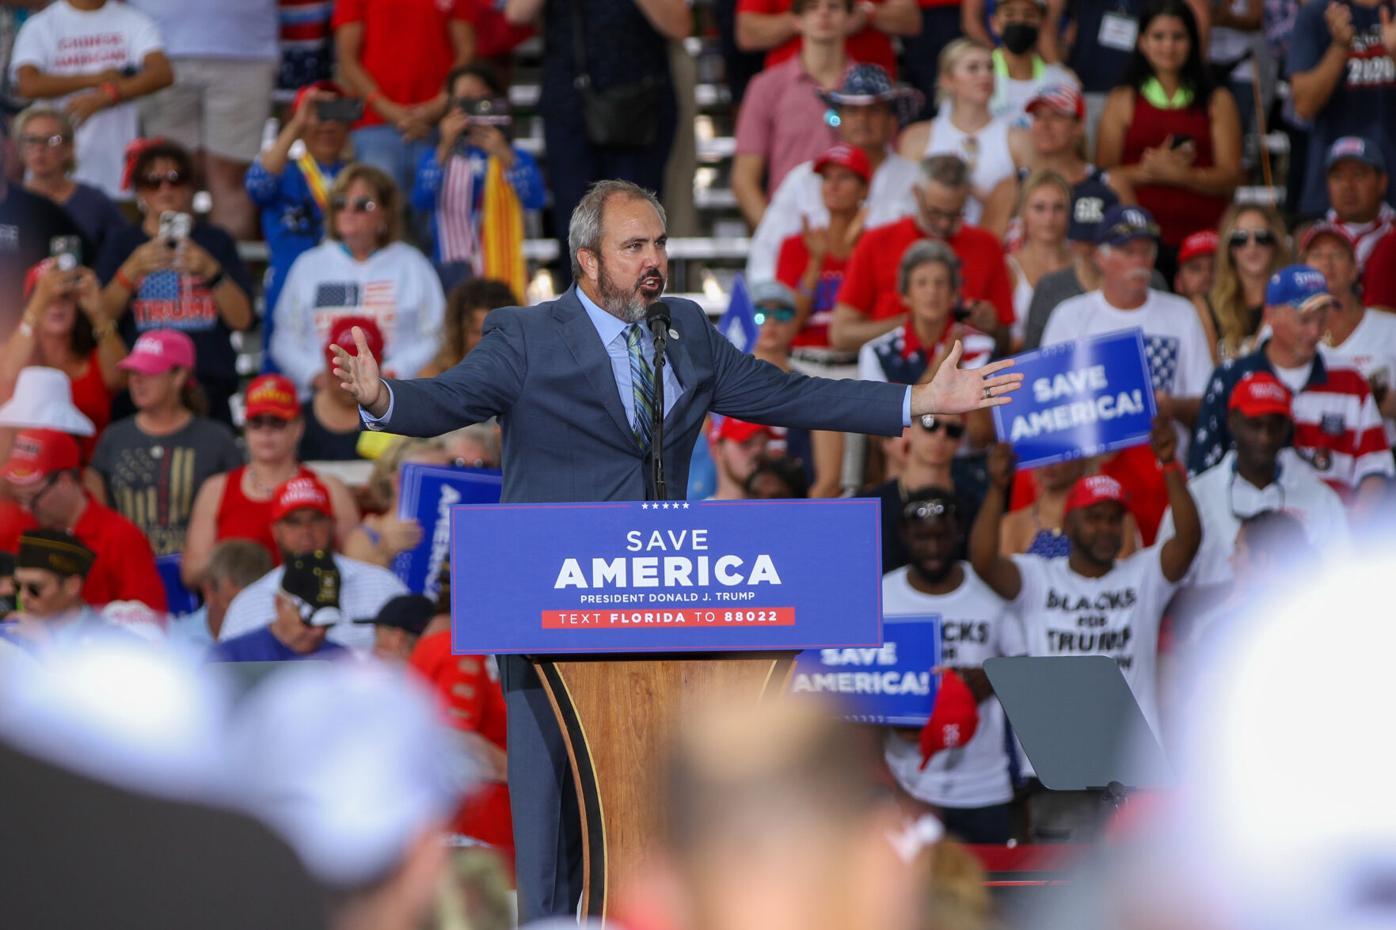 Sarasota Trump Save America rally